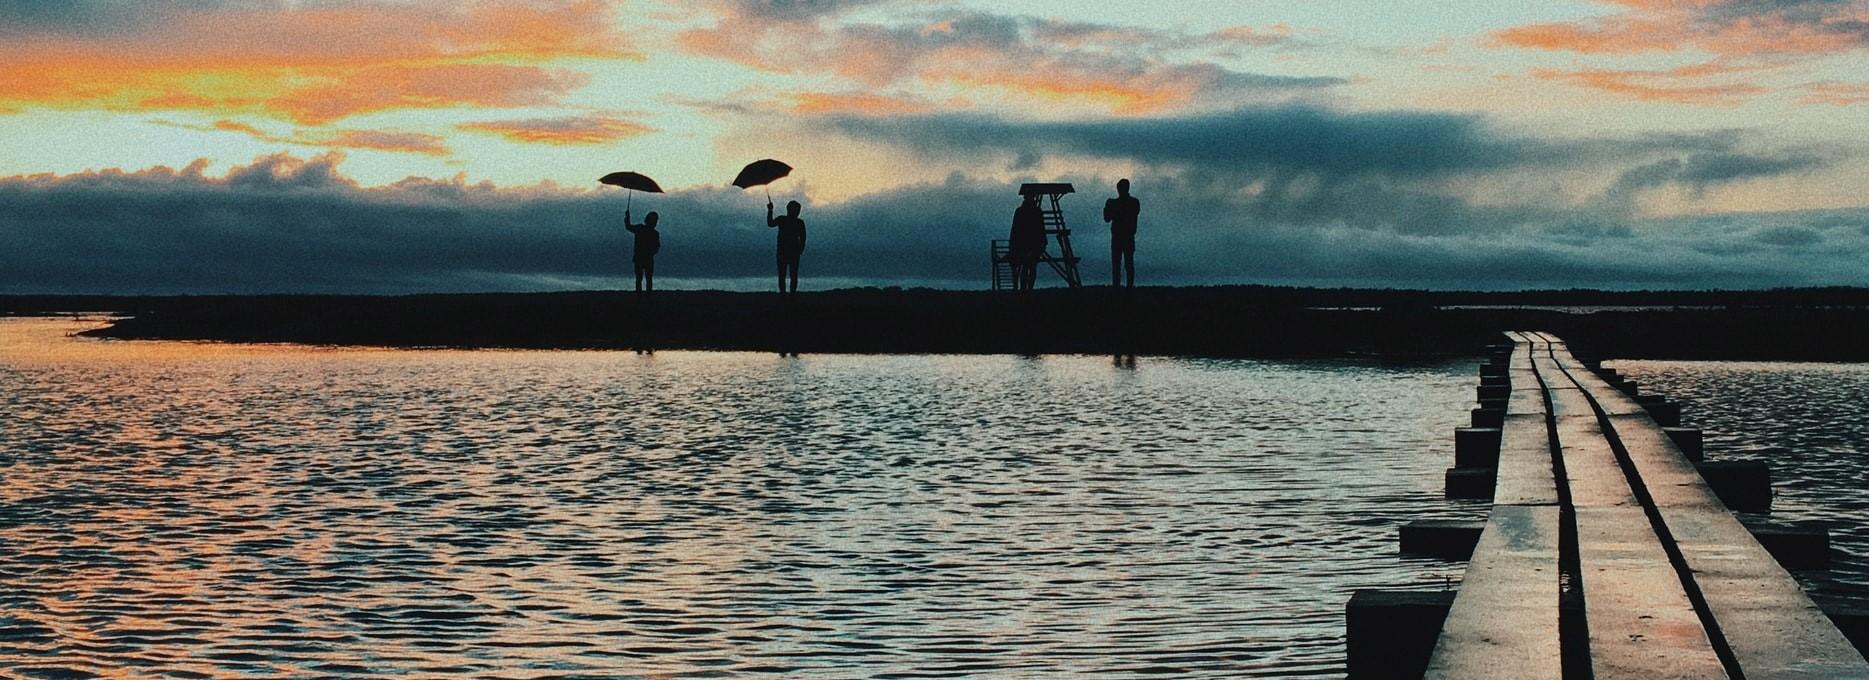 Photo by Nellia Kurme on Unsplash